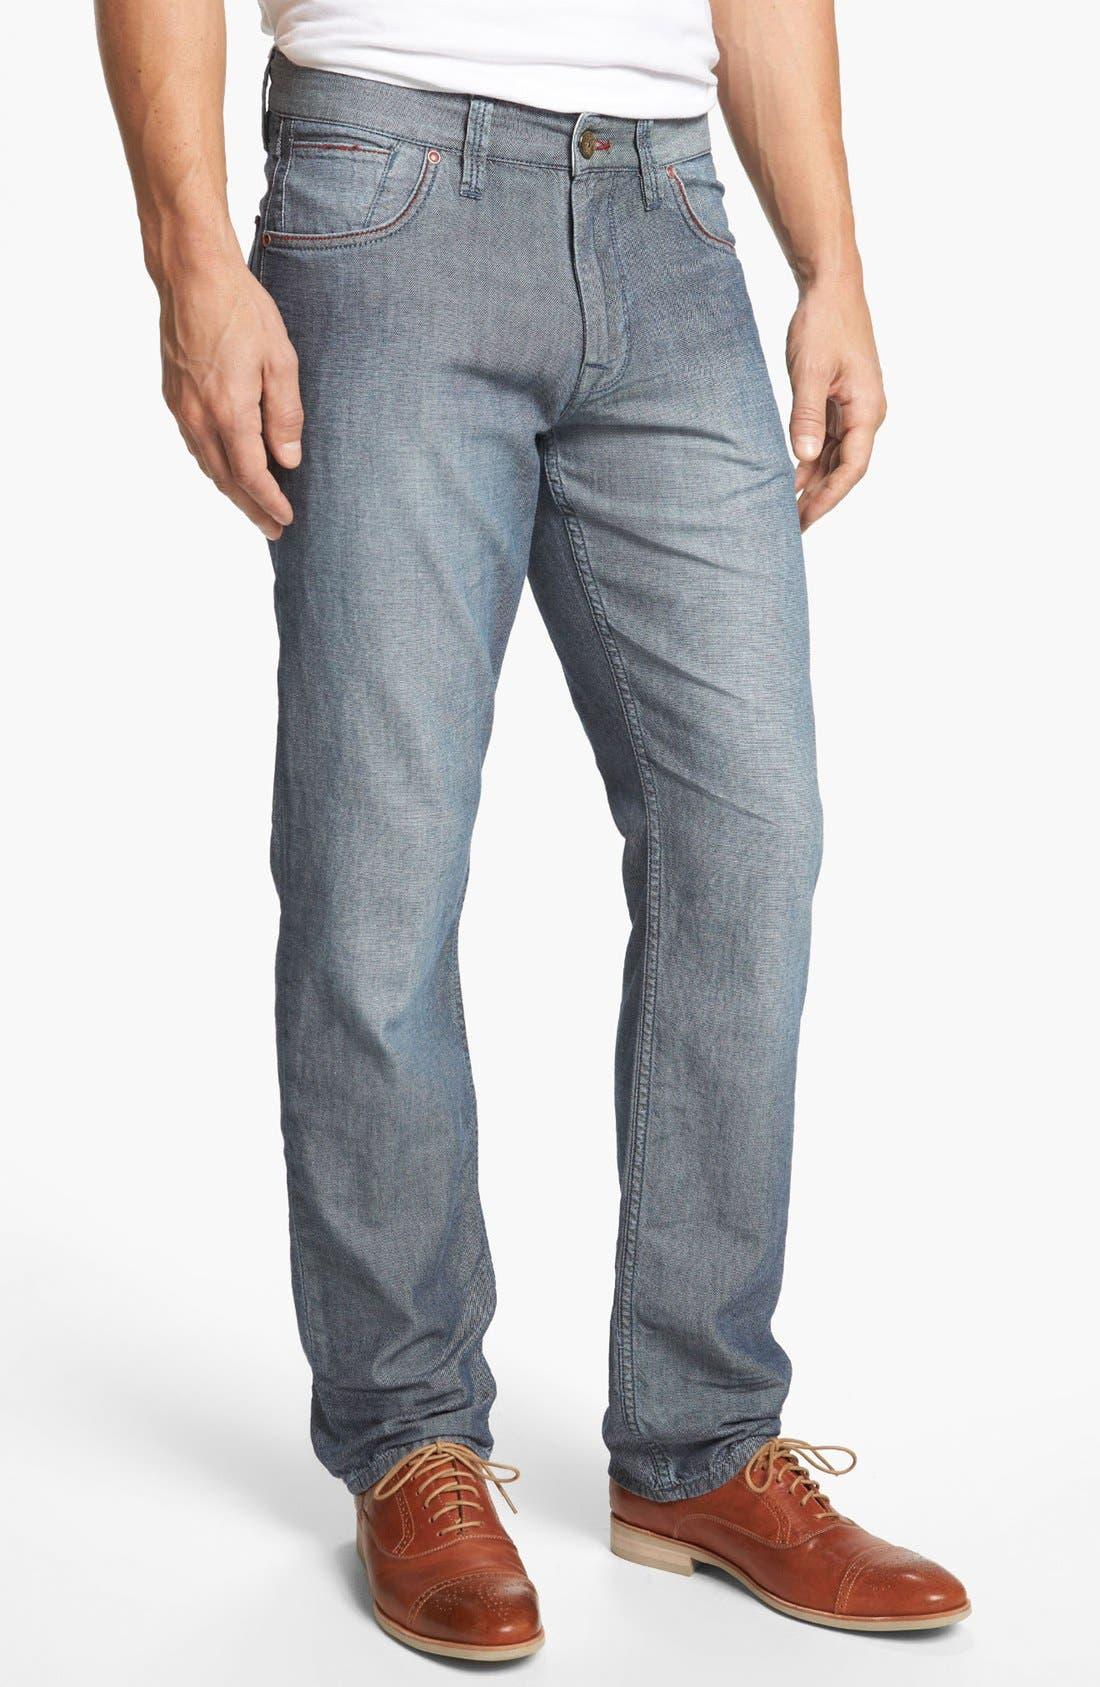 Alternate Image 1 Selected - Robert Graham 'Denim Nails' Classic Fit Jeans (Indigo)